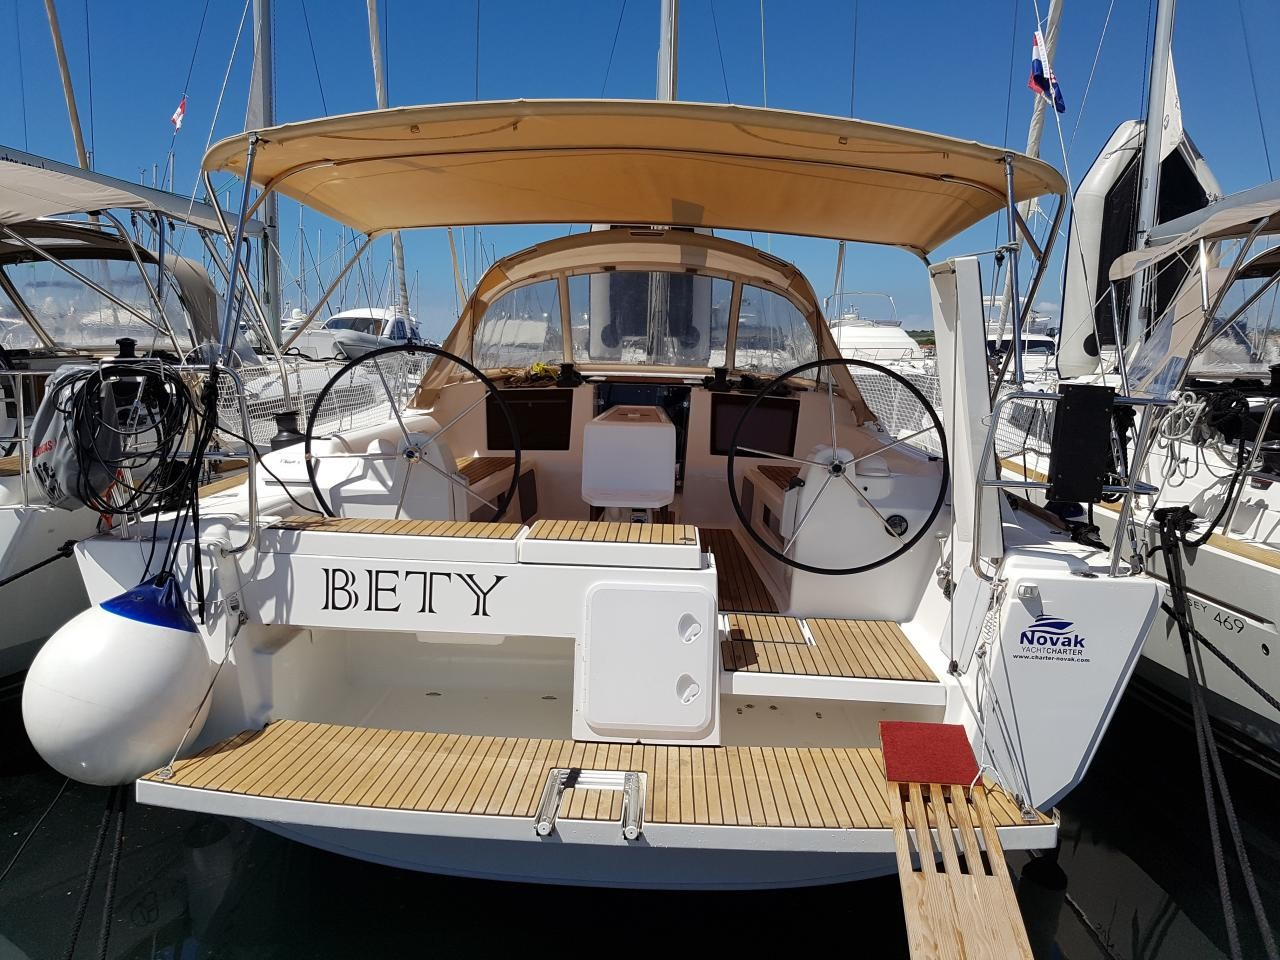 Dufour 412 GL, Bety